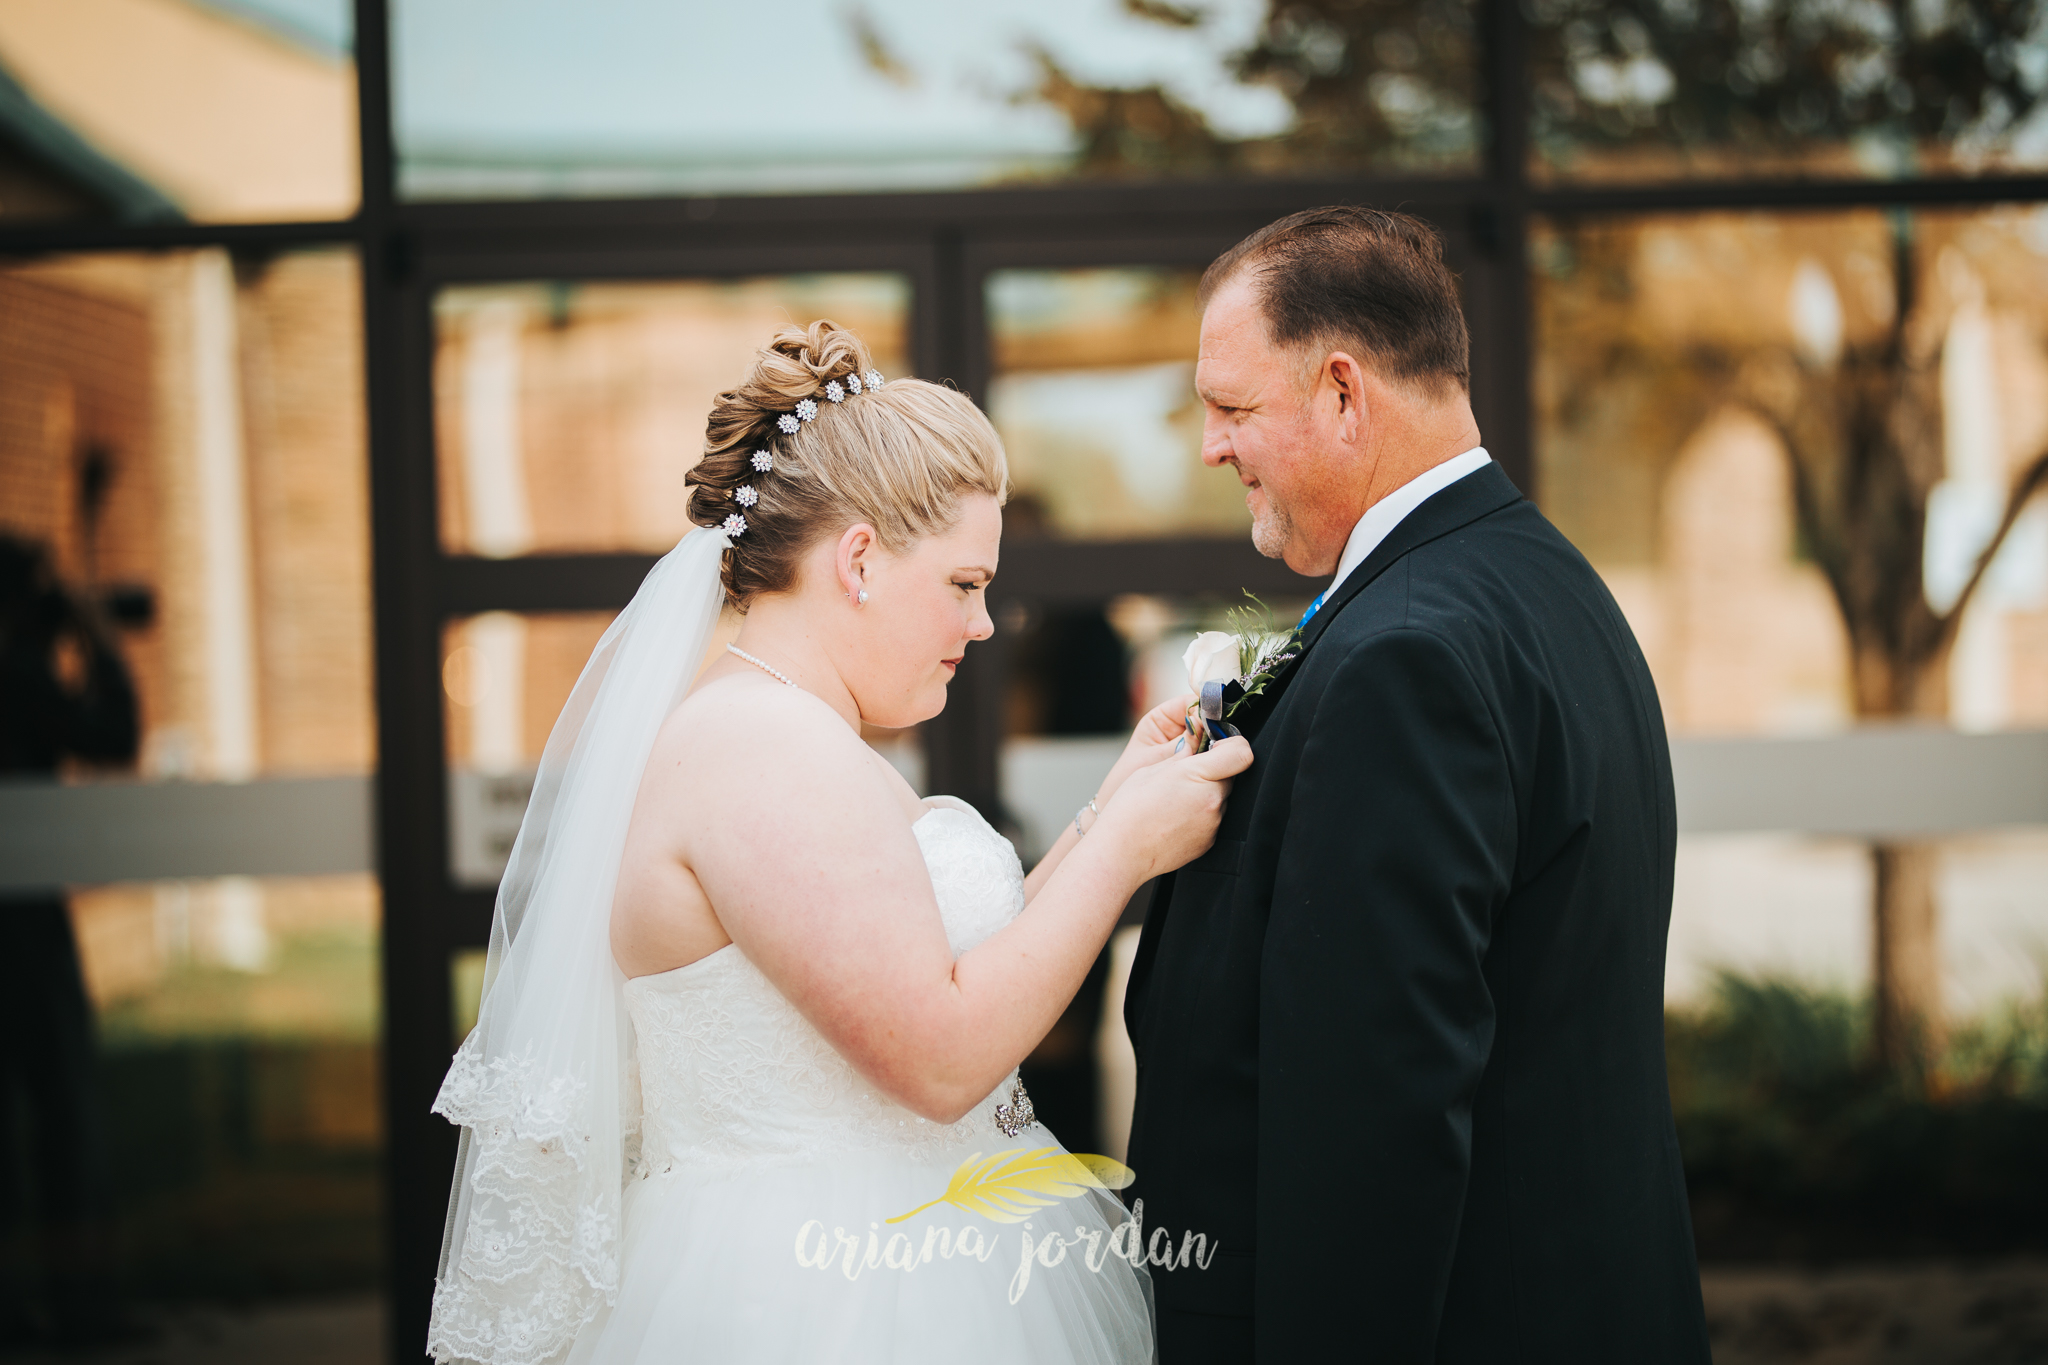 0021 Ariana Jordan Photography - Georgetown KY Wedding Photographer 6104.jpg